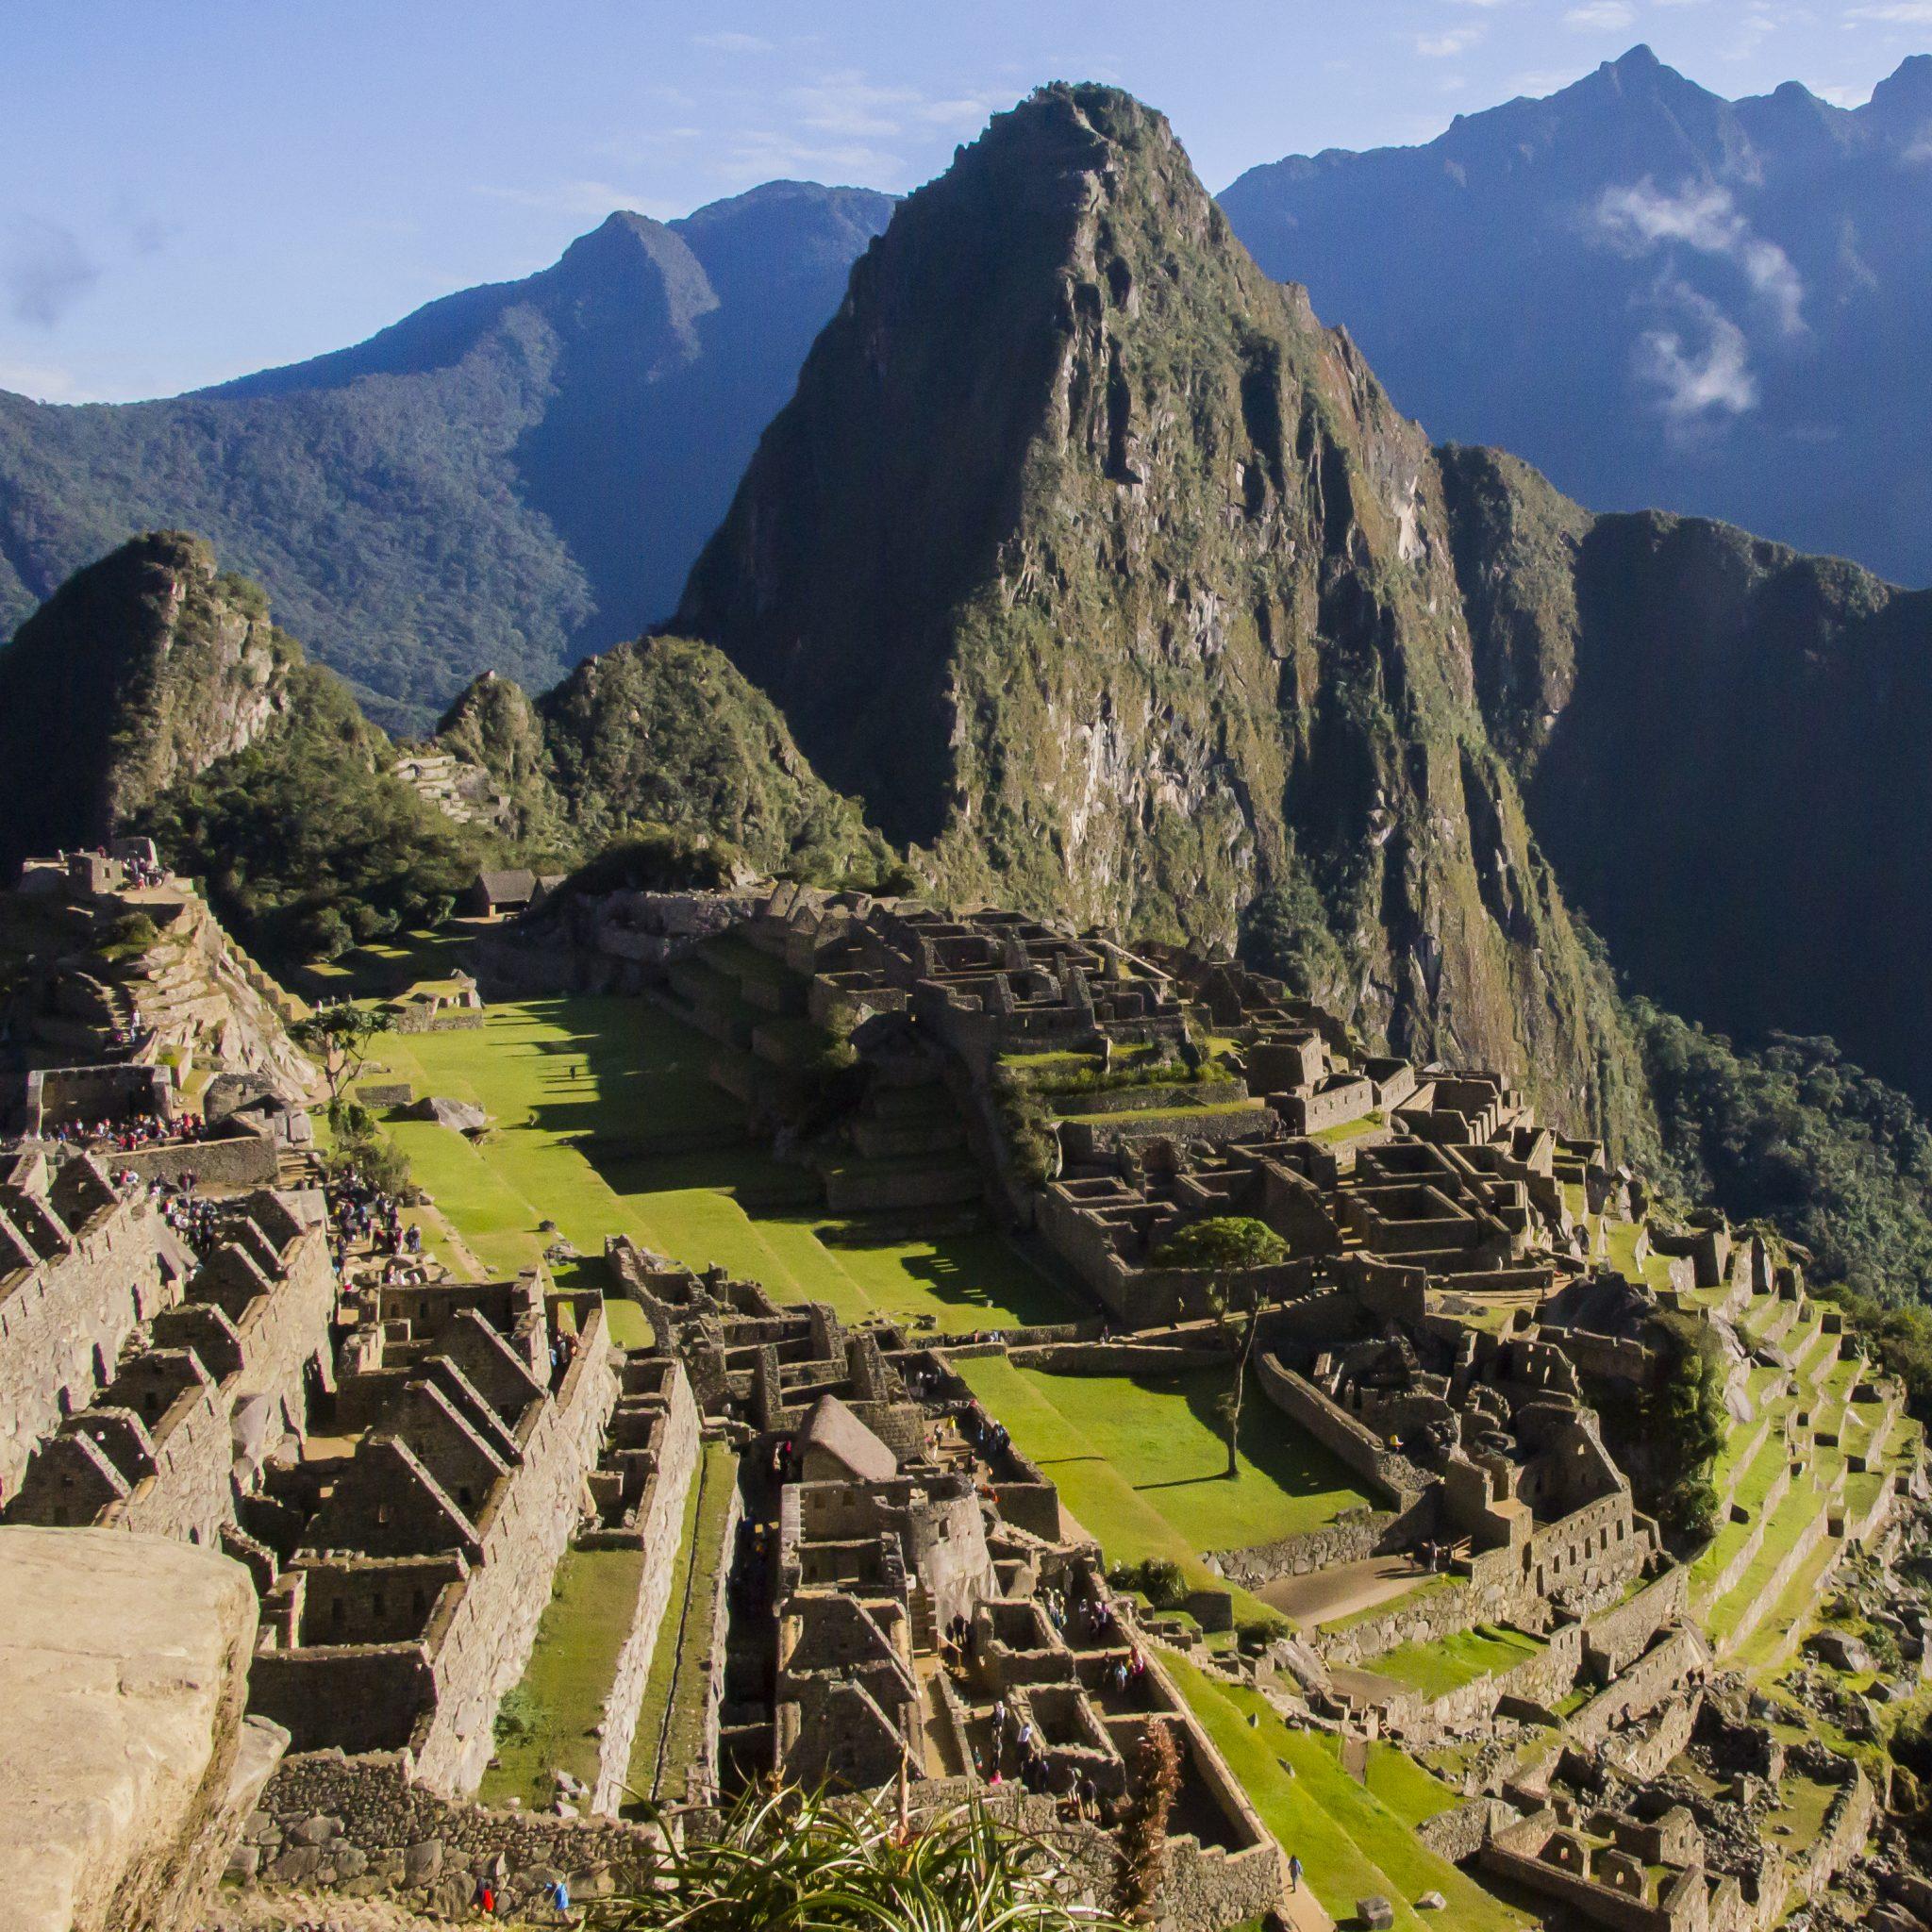 Huayna Picchu seen from the Sun Gate, Machu Picchu